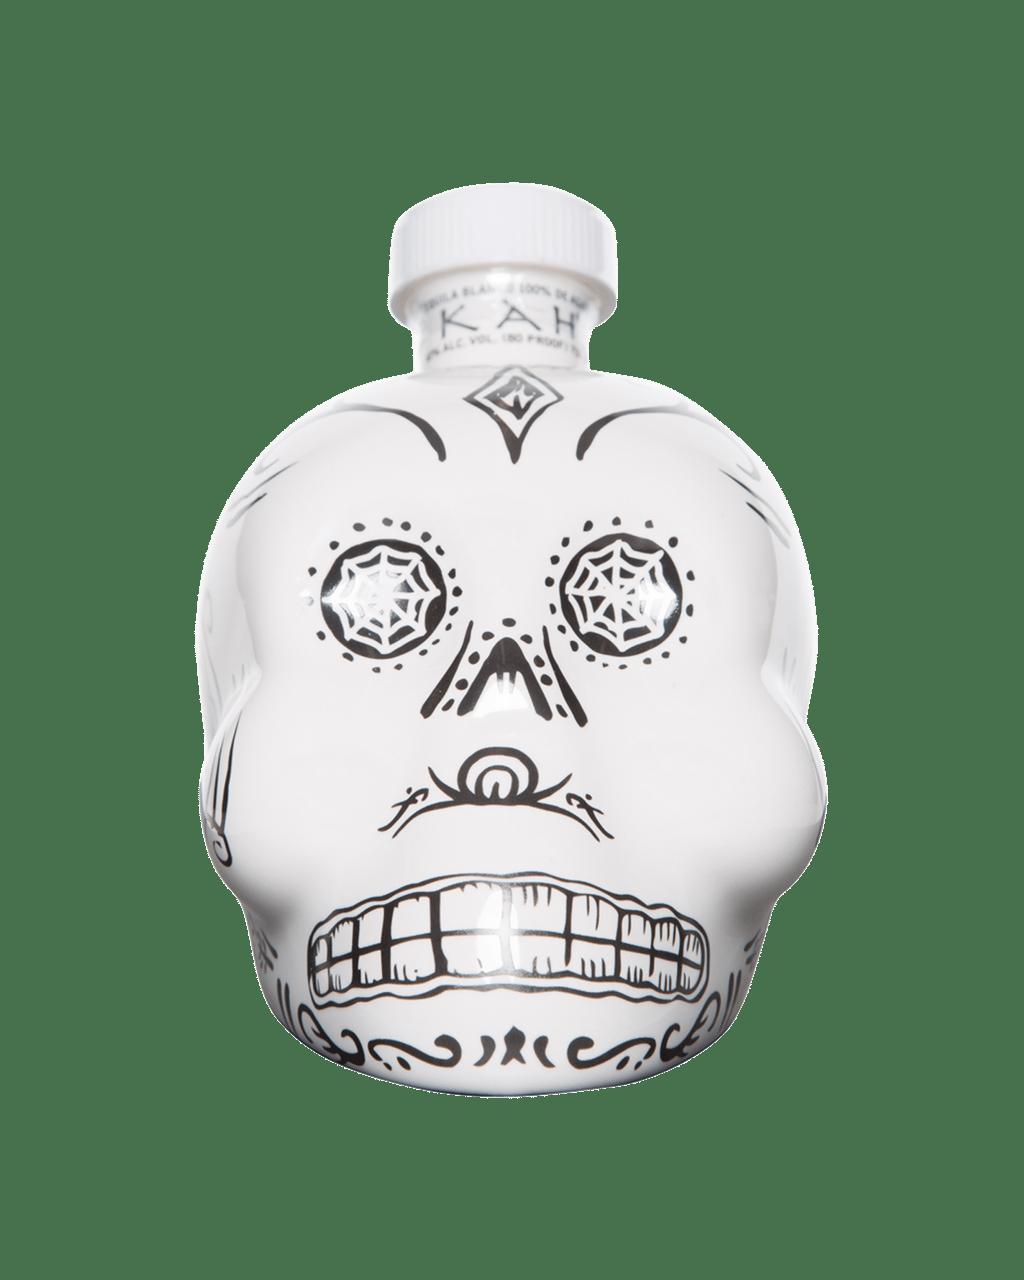 d26d7adbdee Kah Skull Blanco Tequila 750mL